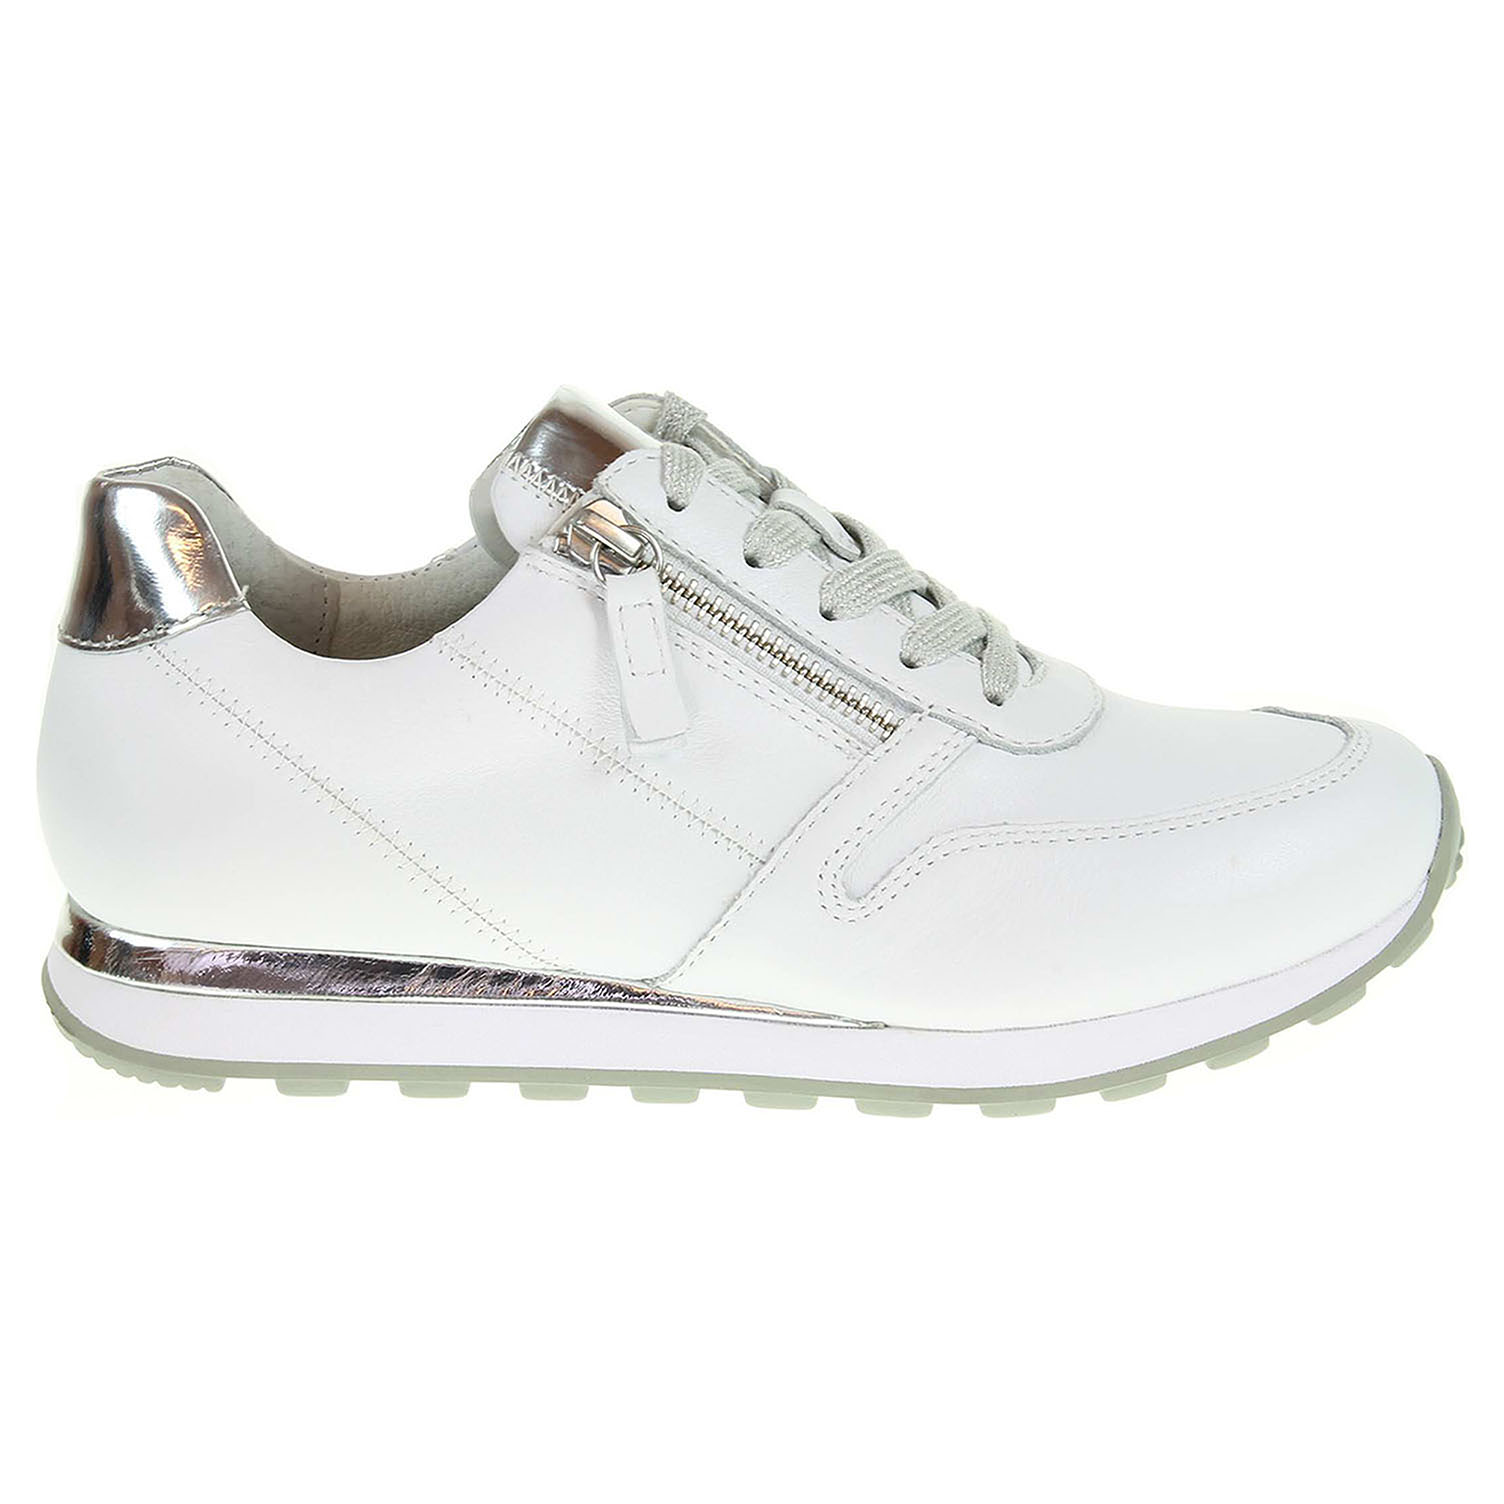 Ecco Gabor dámská obuv 66.368.50 bílá 23200644